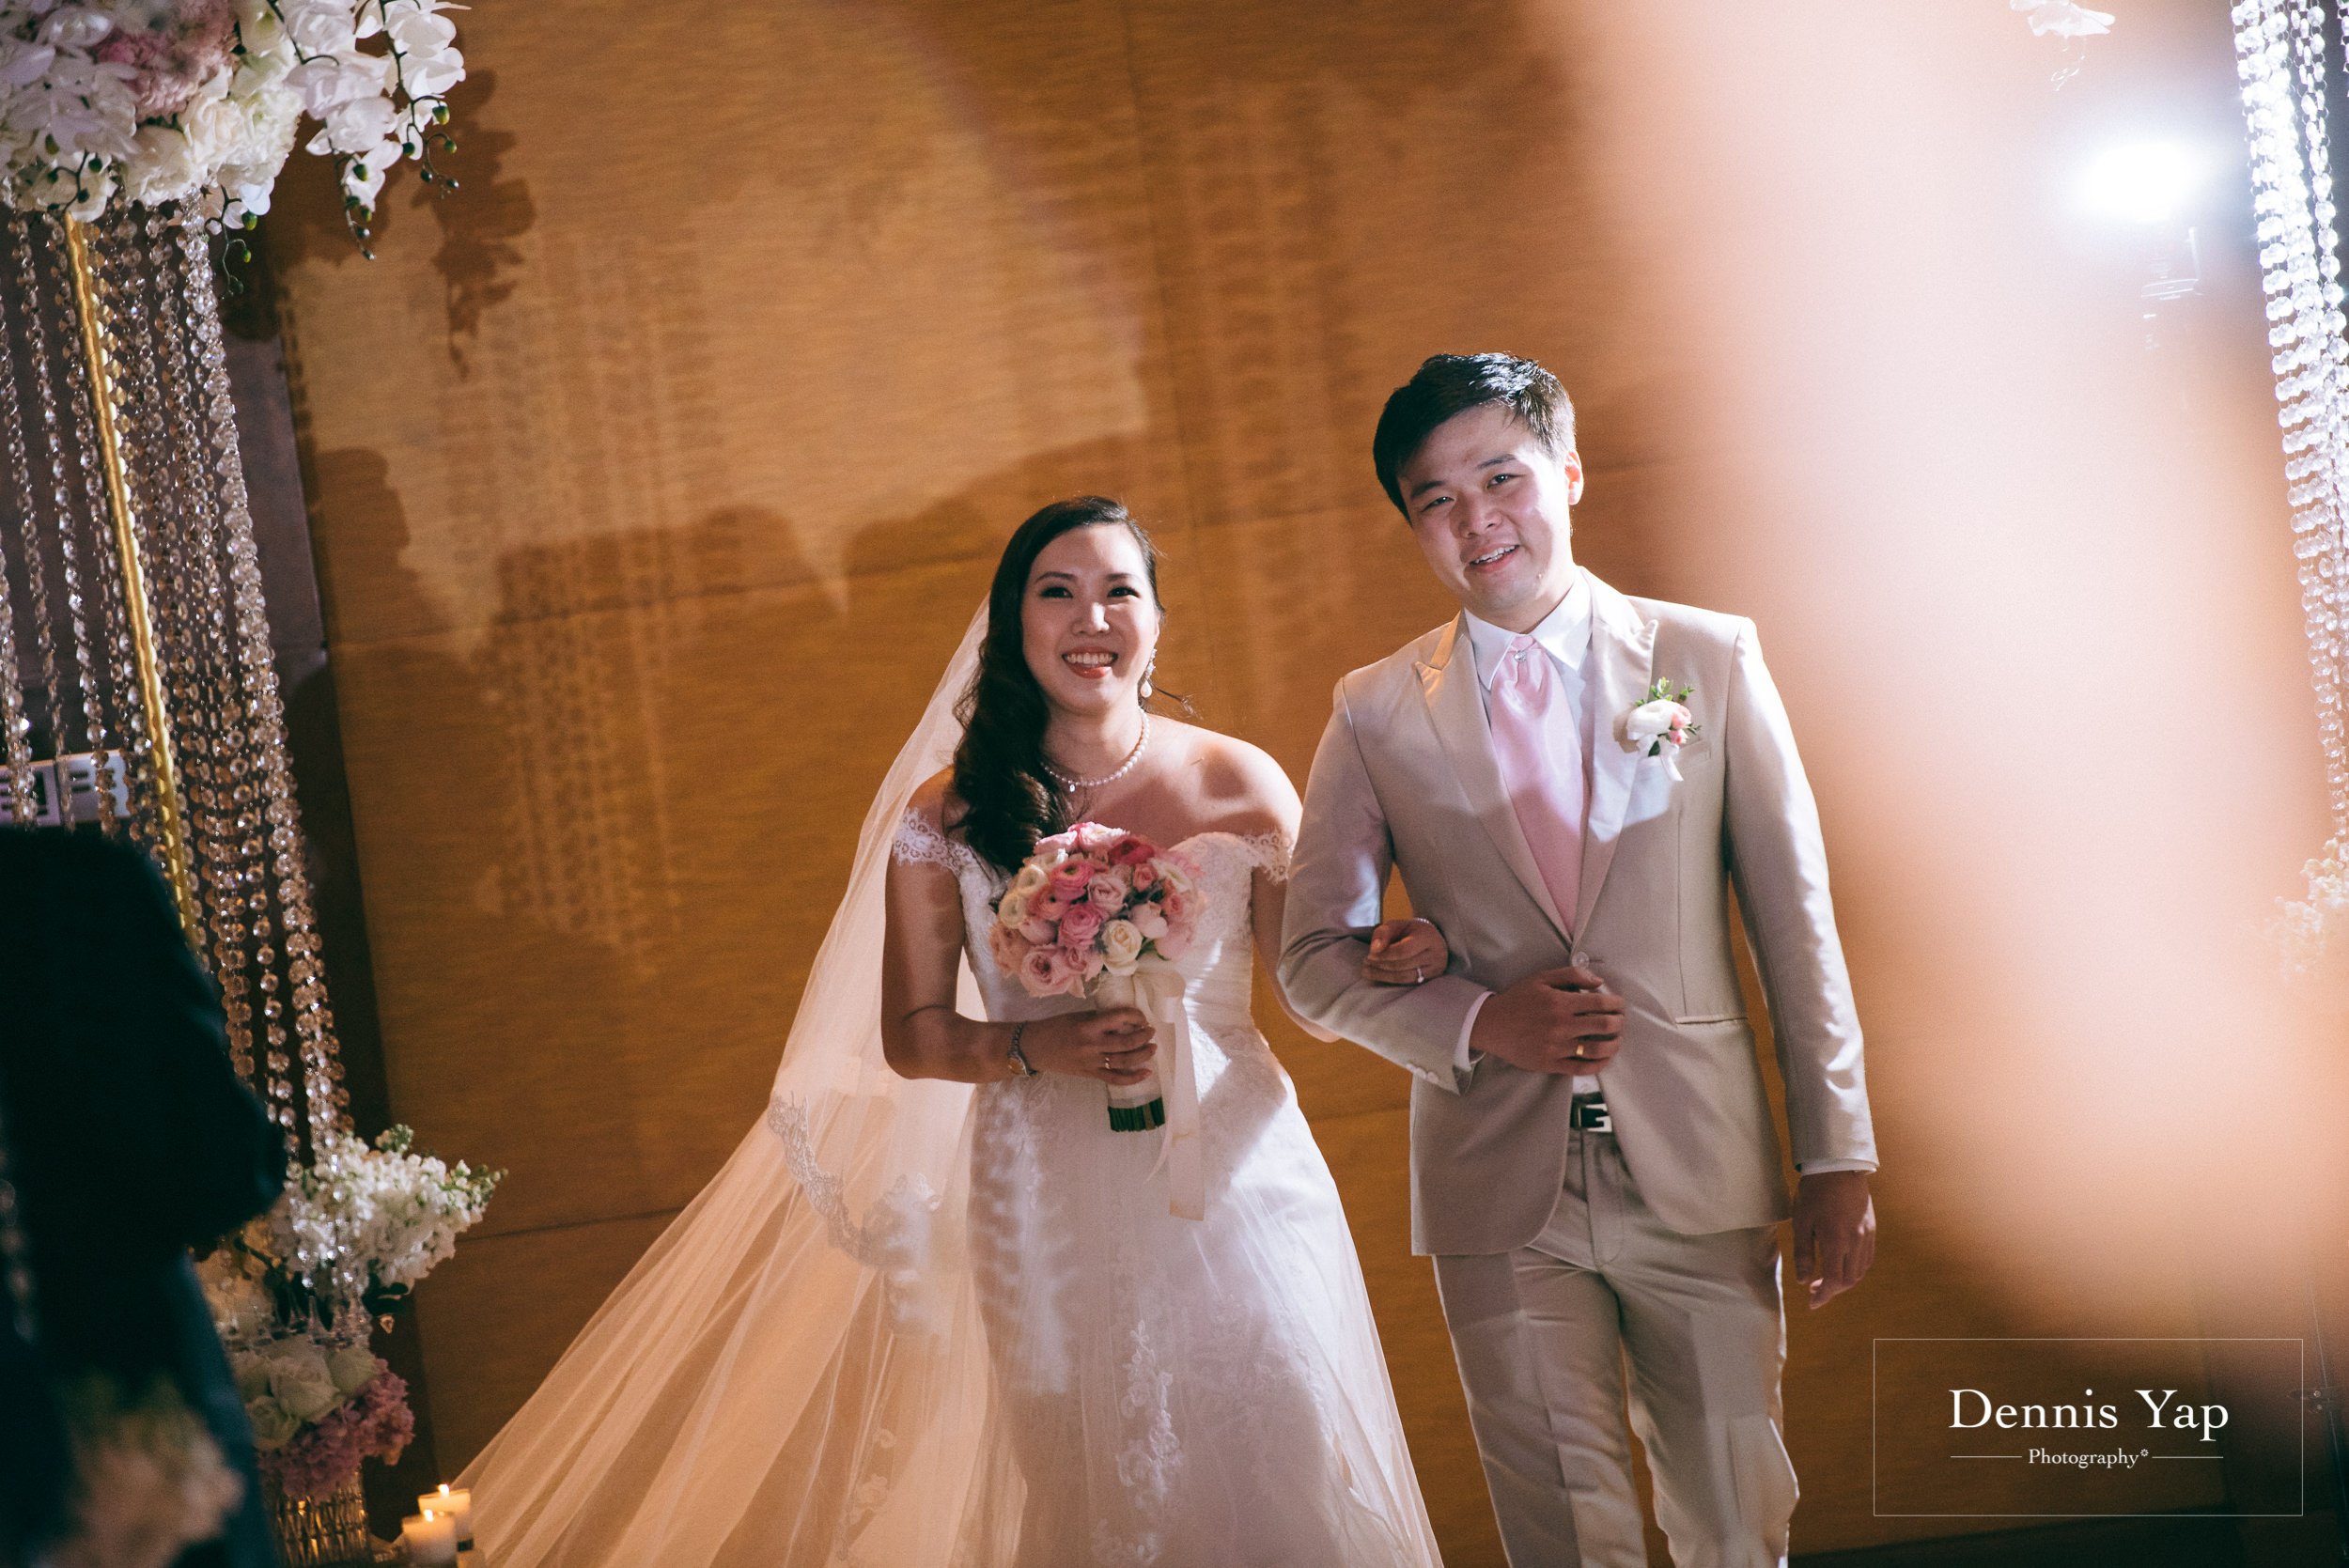 nelson bee yi wedding banquet grand hyatt kuala lumpur dennis yap photography jovita lo wedding-5.jpg